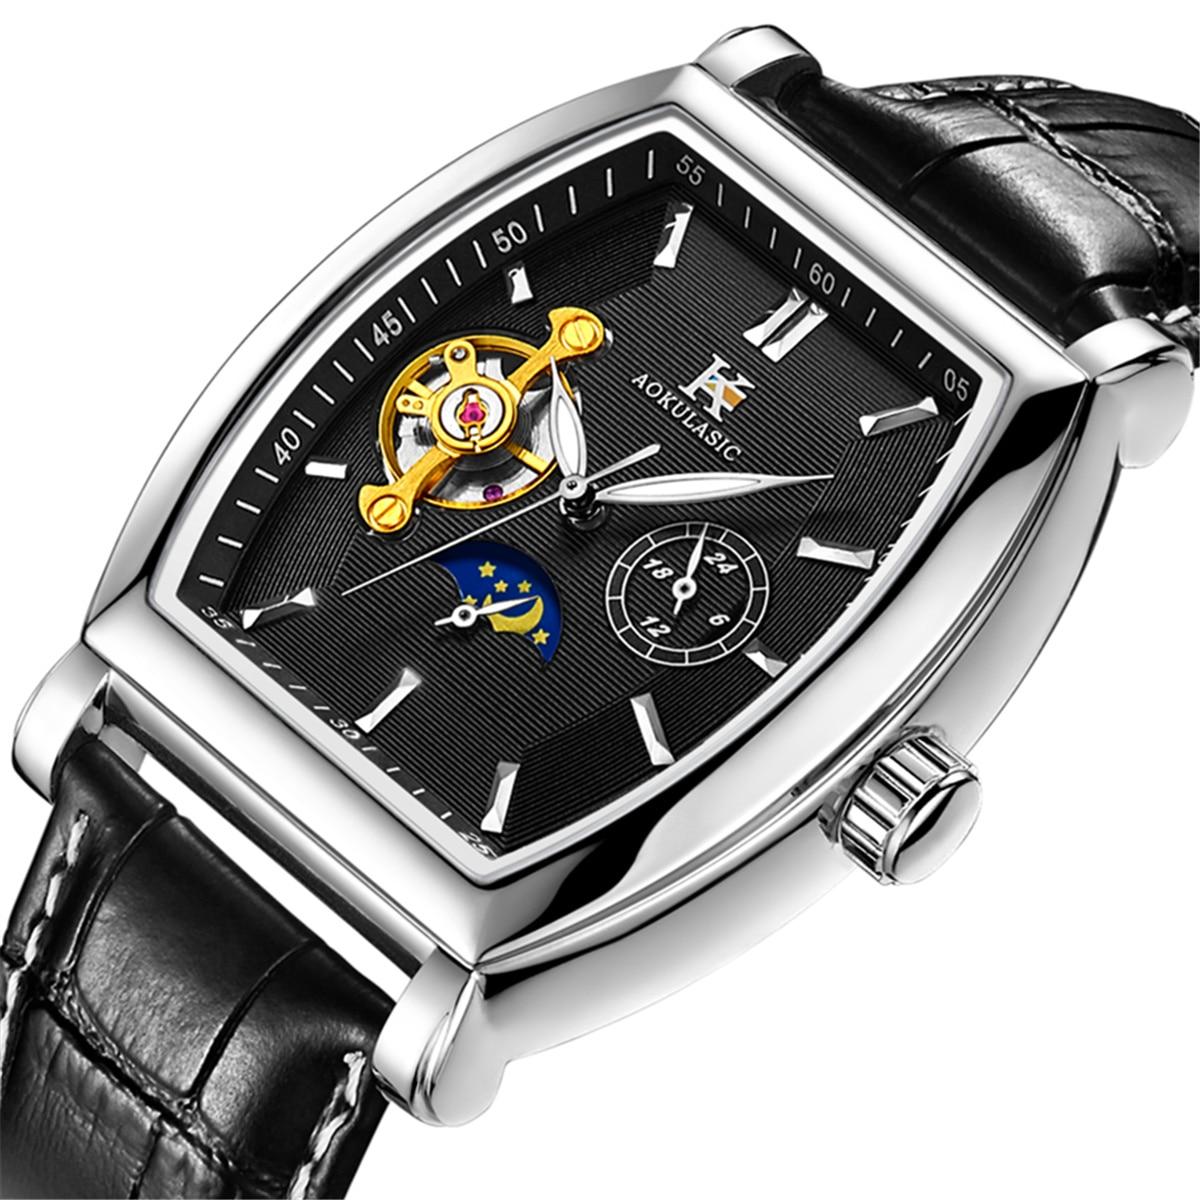 Reloj mecánico automático y transparente aokelasic para hombre, esqueleto Steampunk, de lujo, de cuerda automática, reloj de cuero para hombre, montre homme